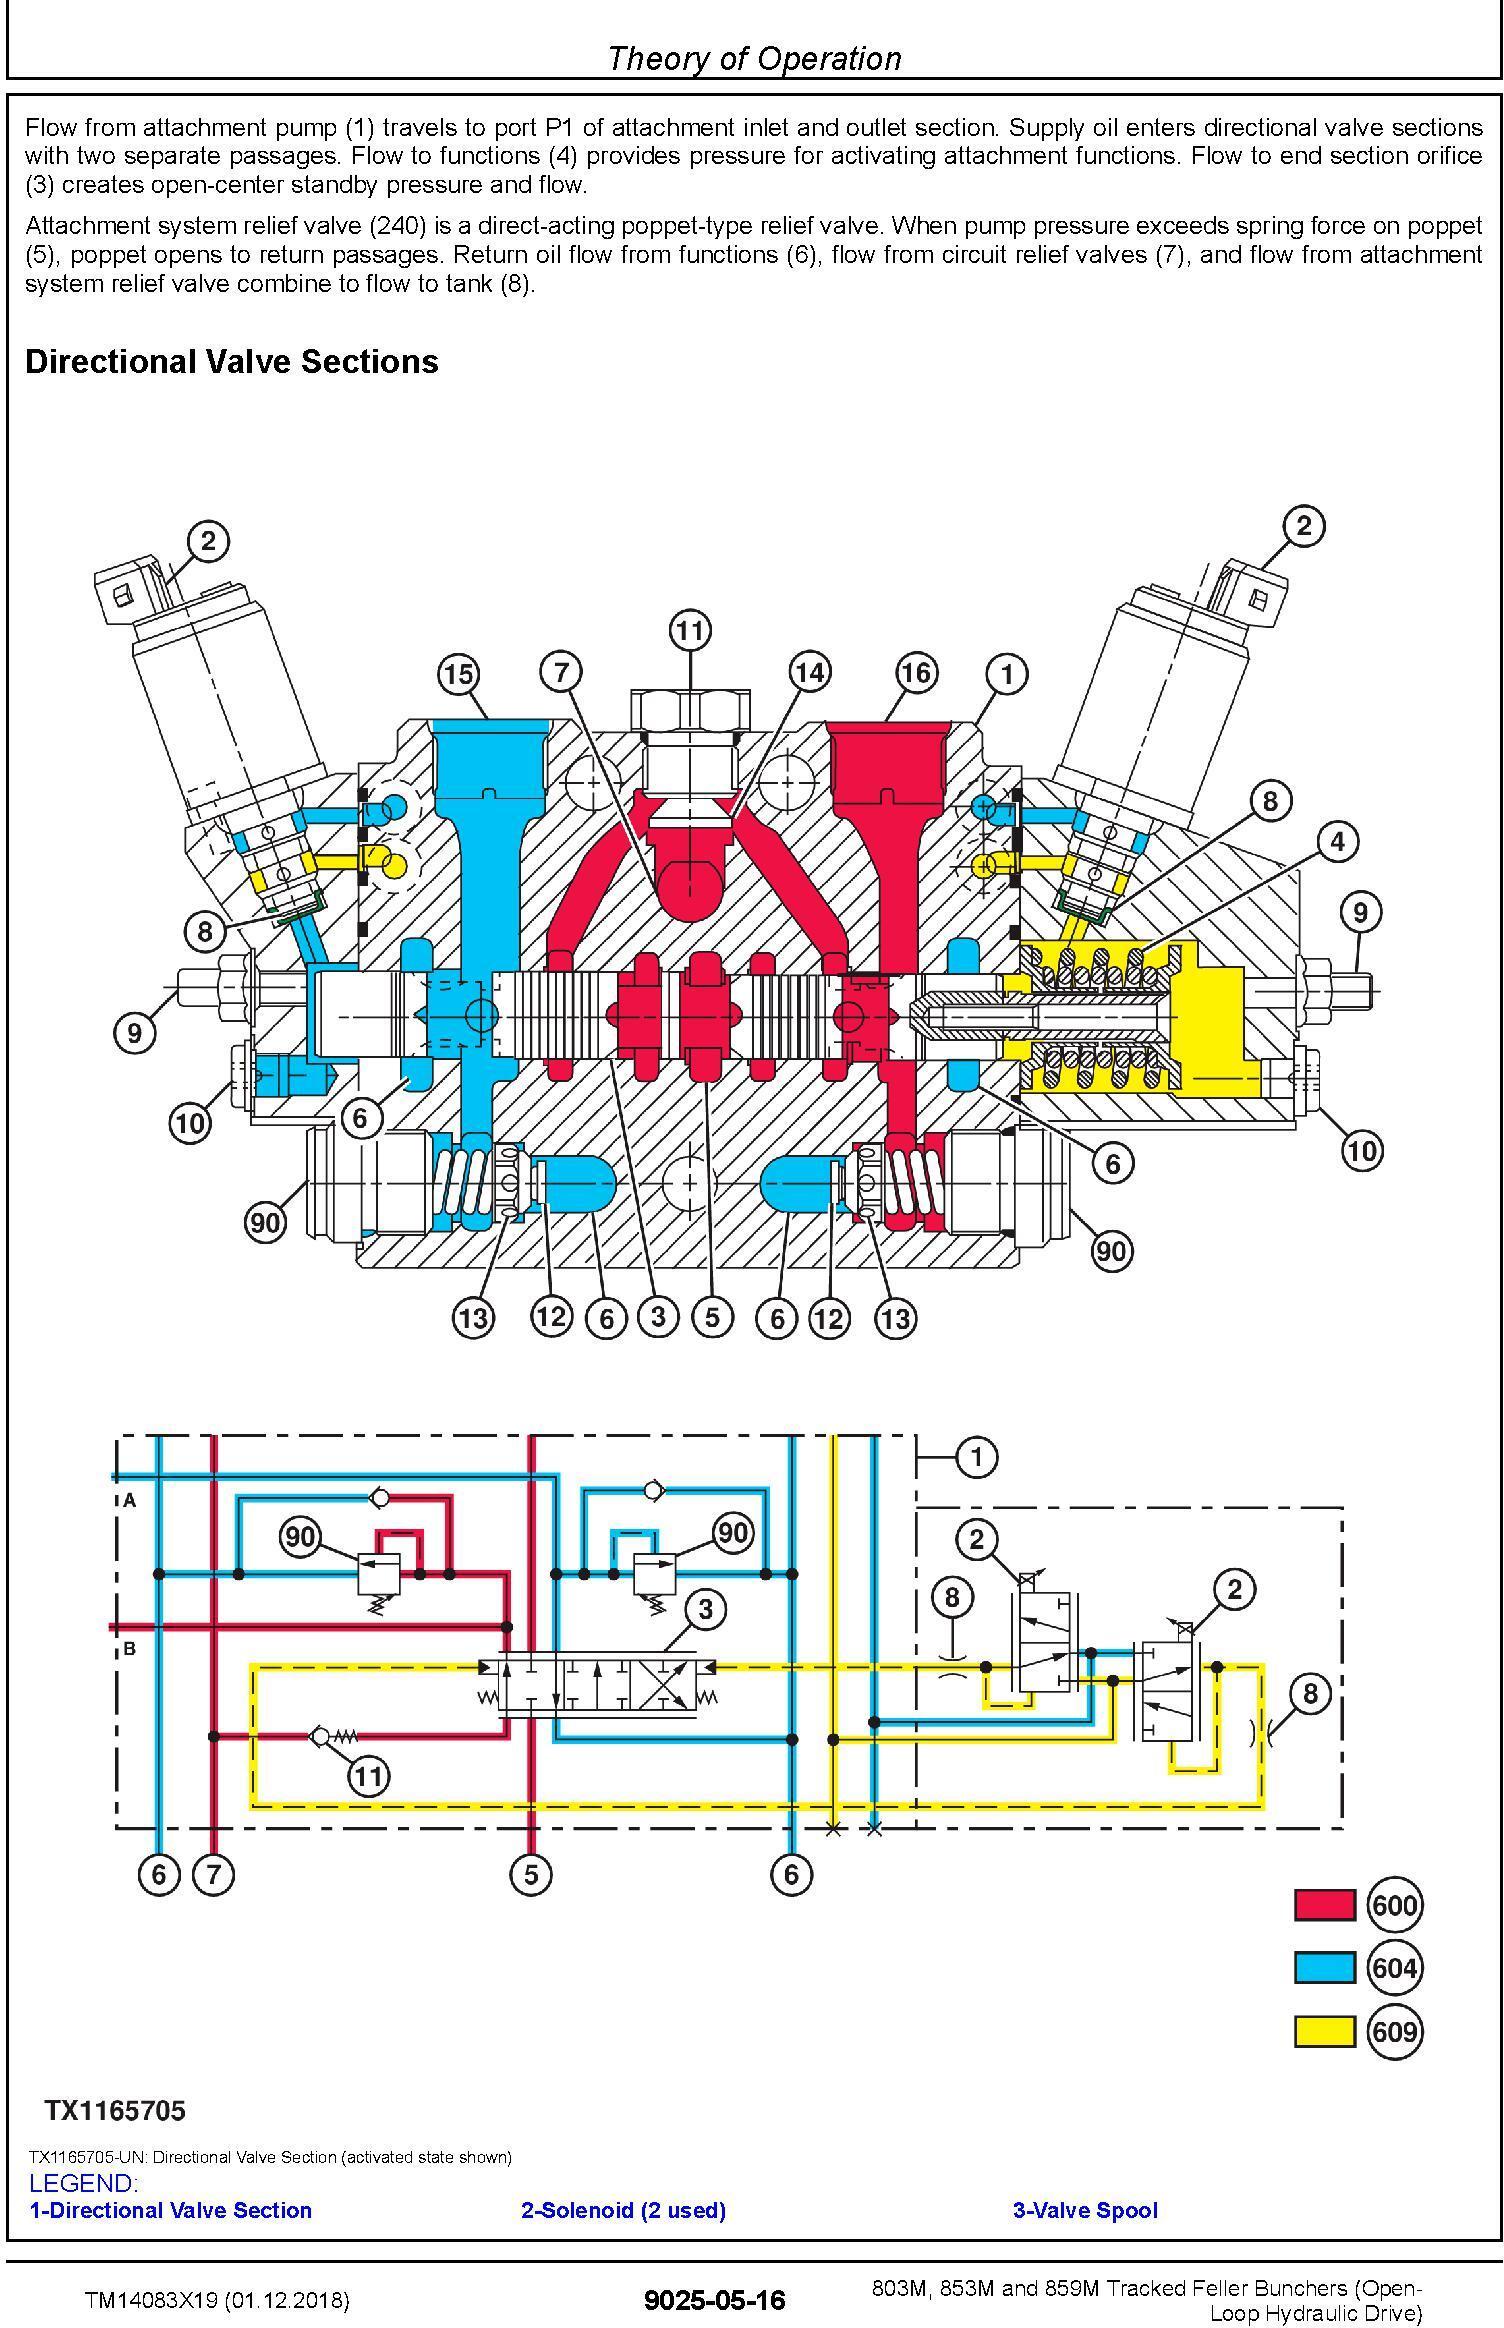 John Deere 803M,853M (SN.F293917-,L343918-) Feller Bunchers (Open-Loop) Diagnostic Manual TM14083X19 - 3